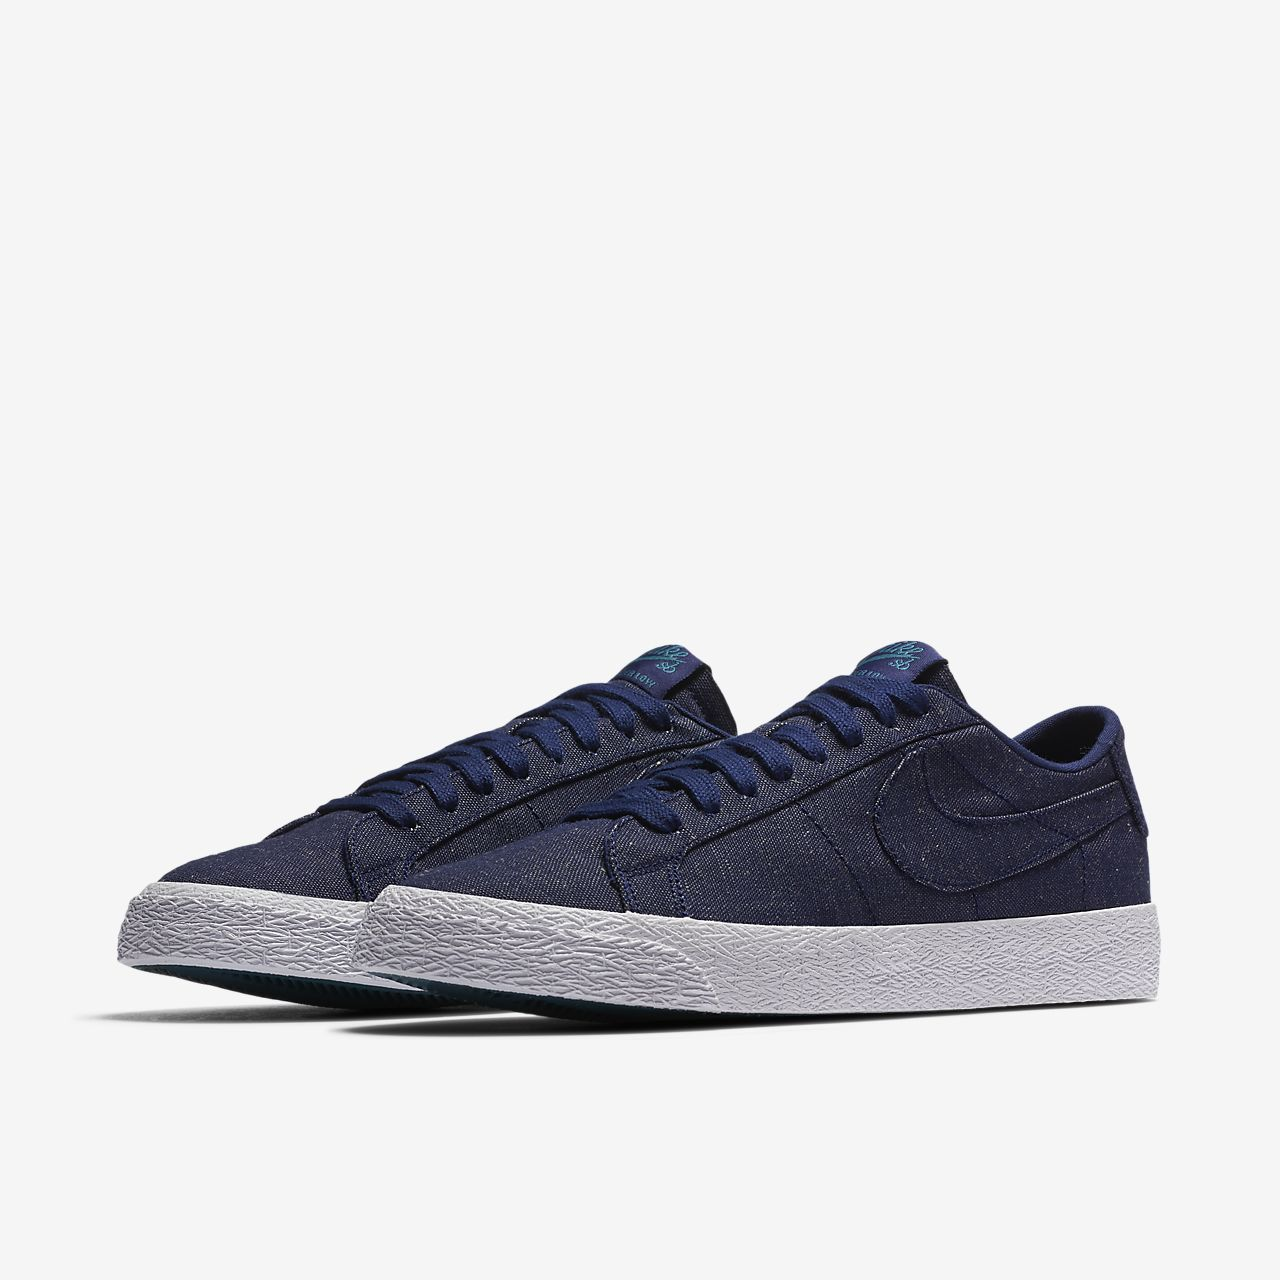 more photos 68230 d5946 ... Nike SB Zoom Blazer Low Canvas Deconstructed Men s Skateboarding Shoe